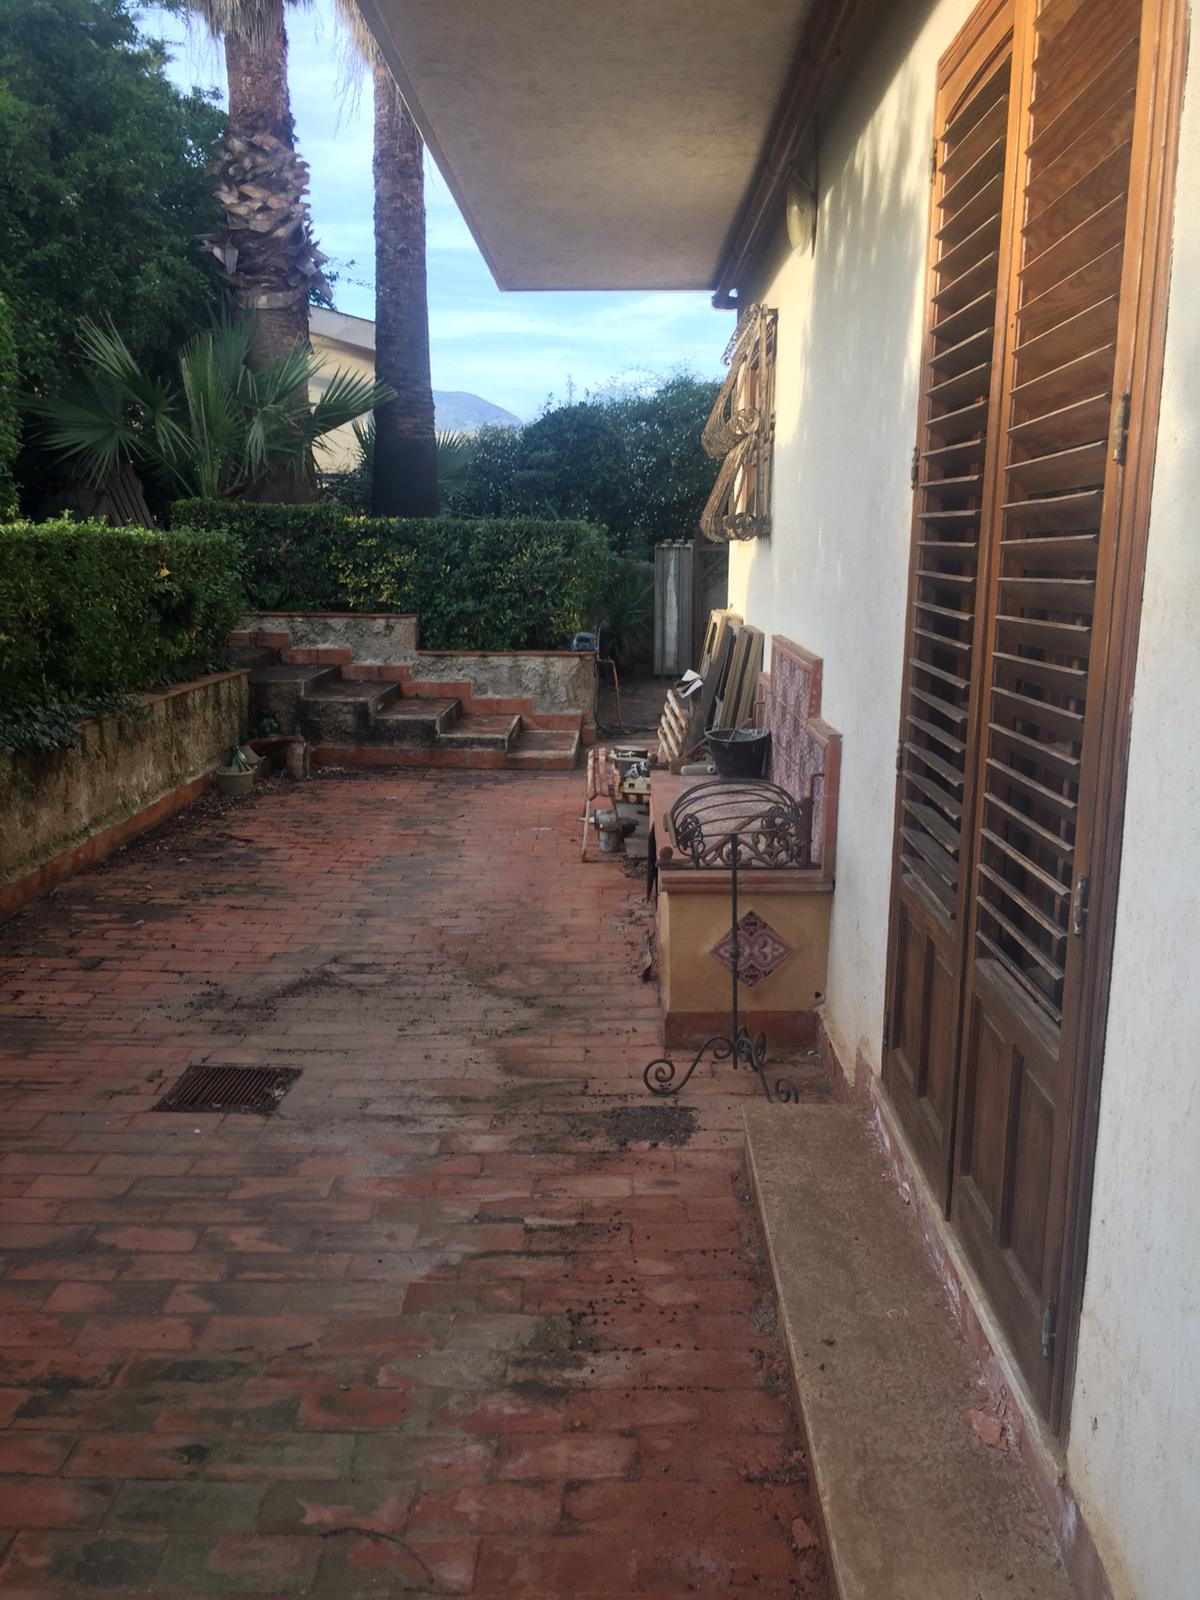 Villa 135 Mq + Terreno Pallavicino/Via V. Epifanio